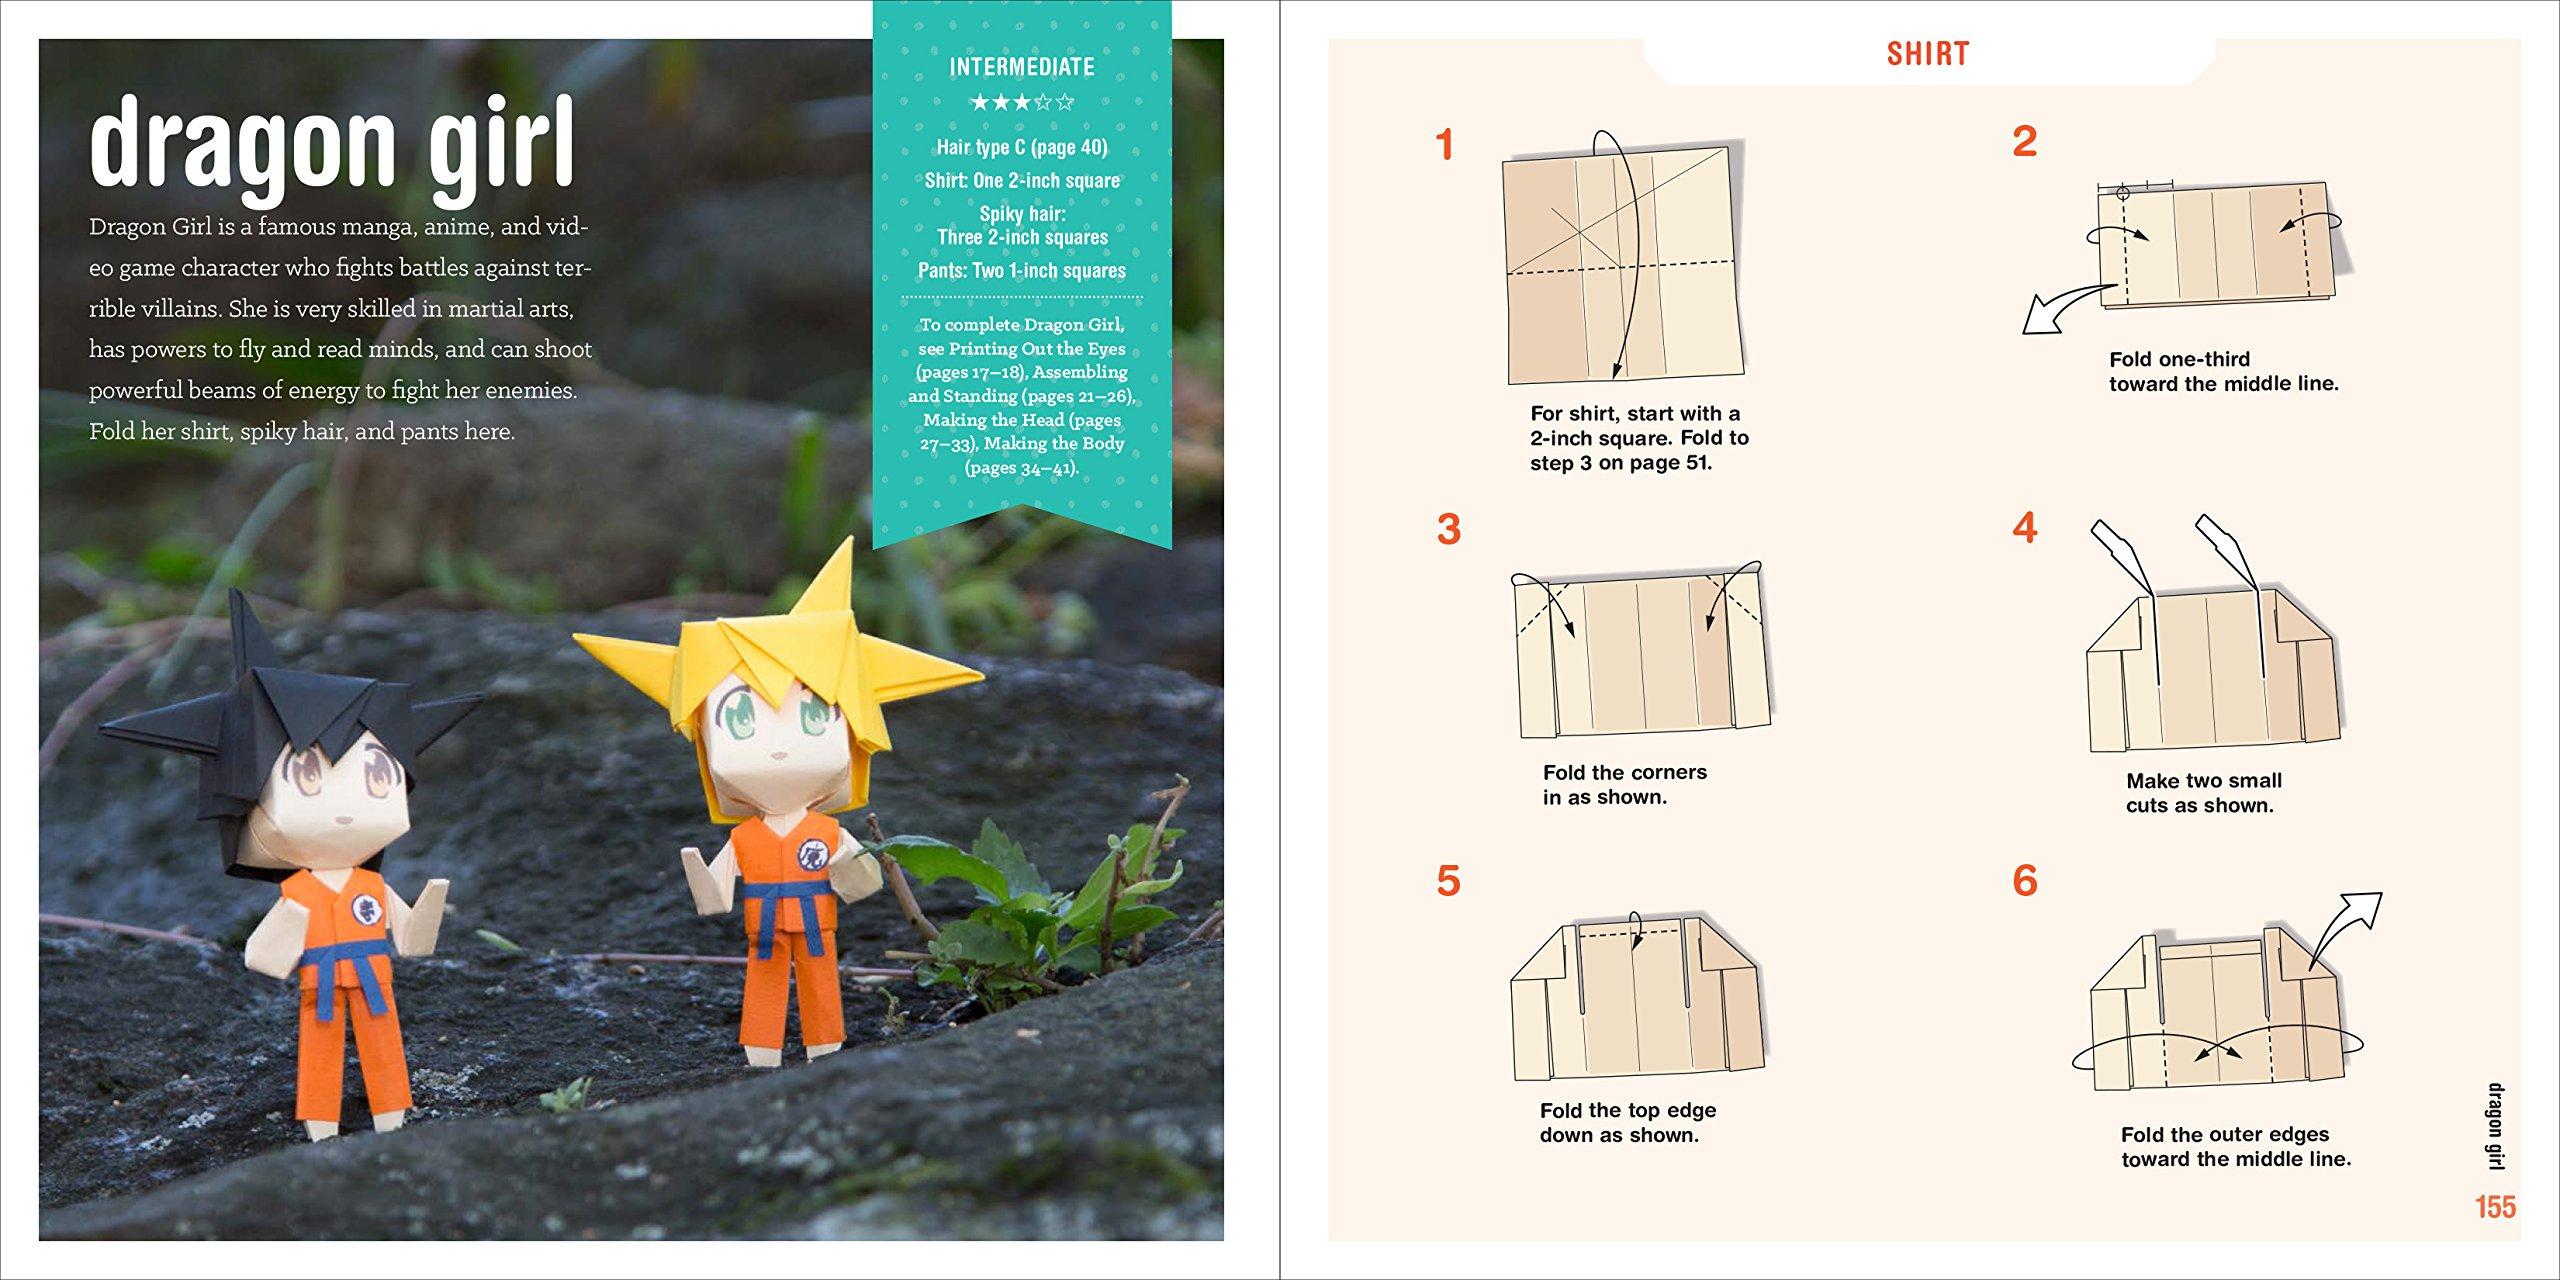 Manga Origami Easy Techniques For Creating 20 Super Cute Characters 3d Animation Diagrams Animated Diagram To Fold A Mrcio Hideshi Noguchi Seth Friedman 9781580934602 Books